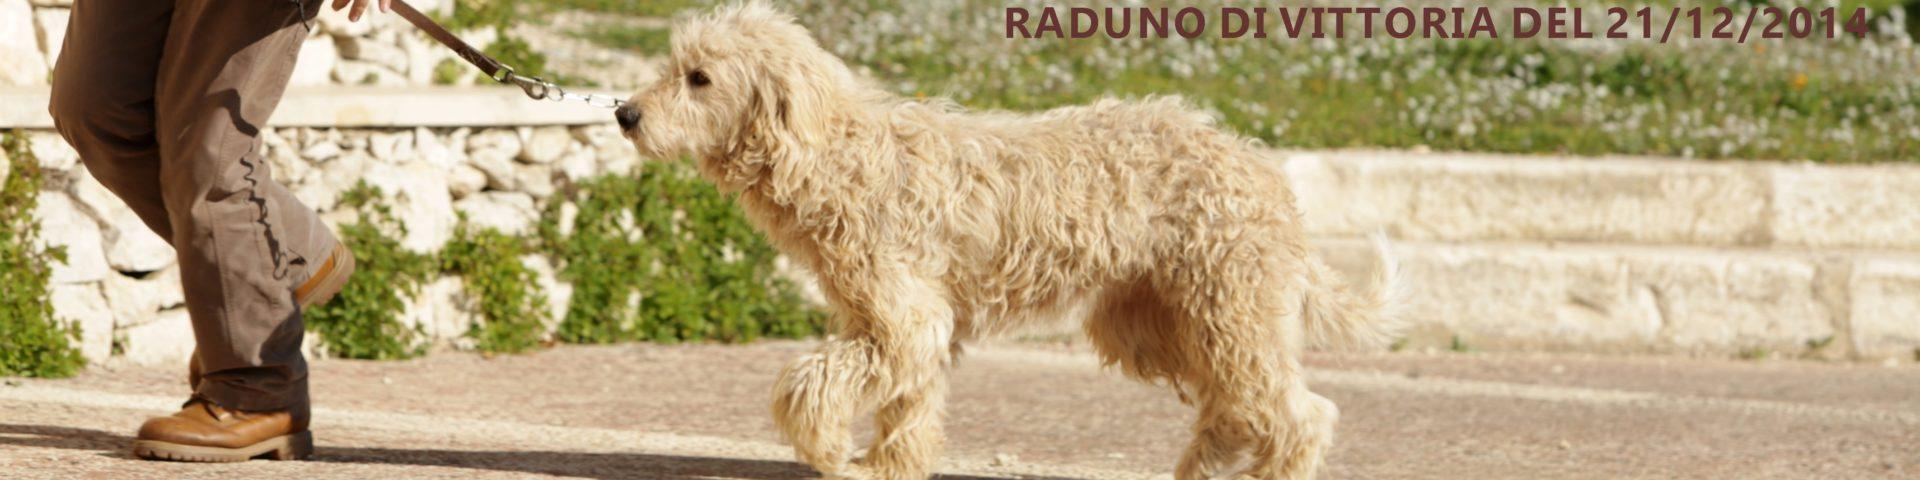 raduno_2014